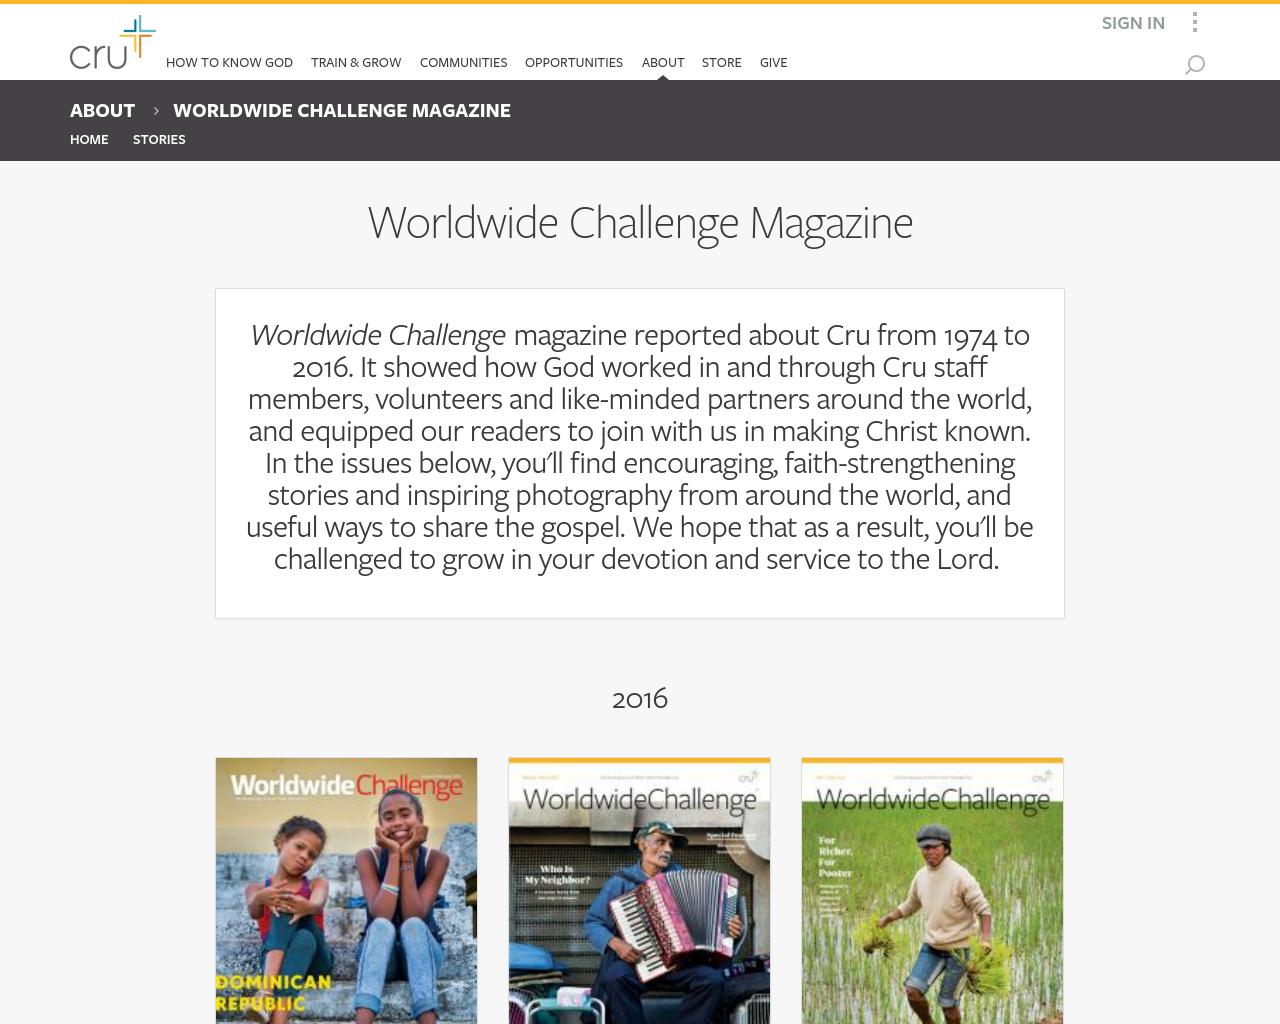 WorldwideChallenge-Advertising-Reviews-Pricing